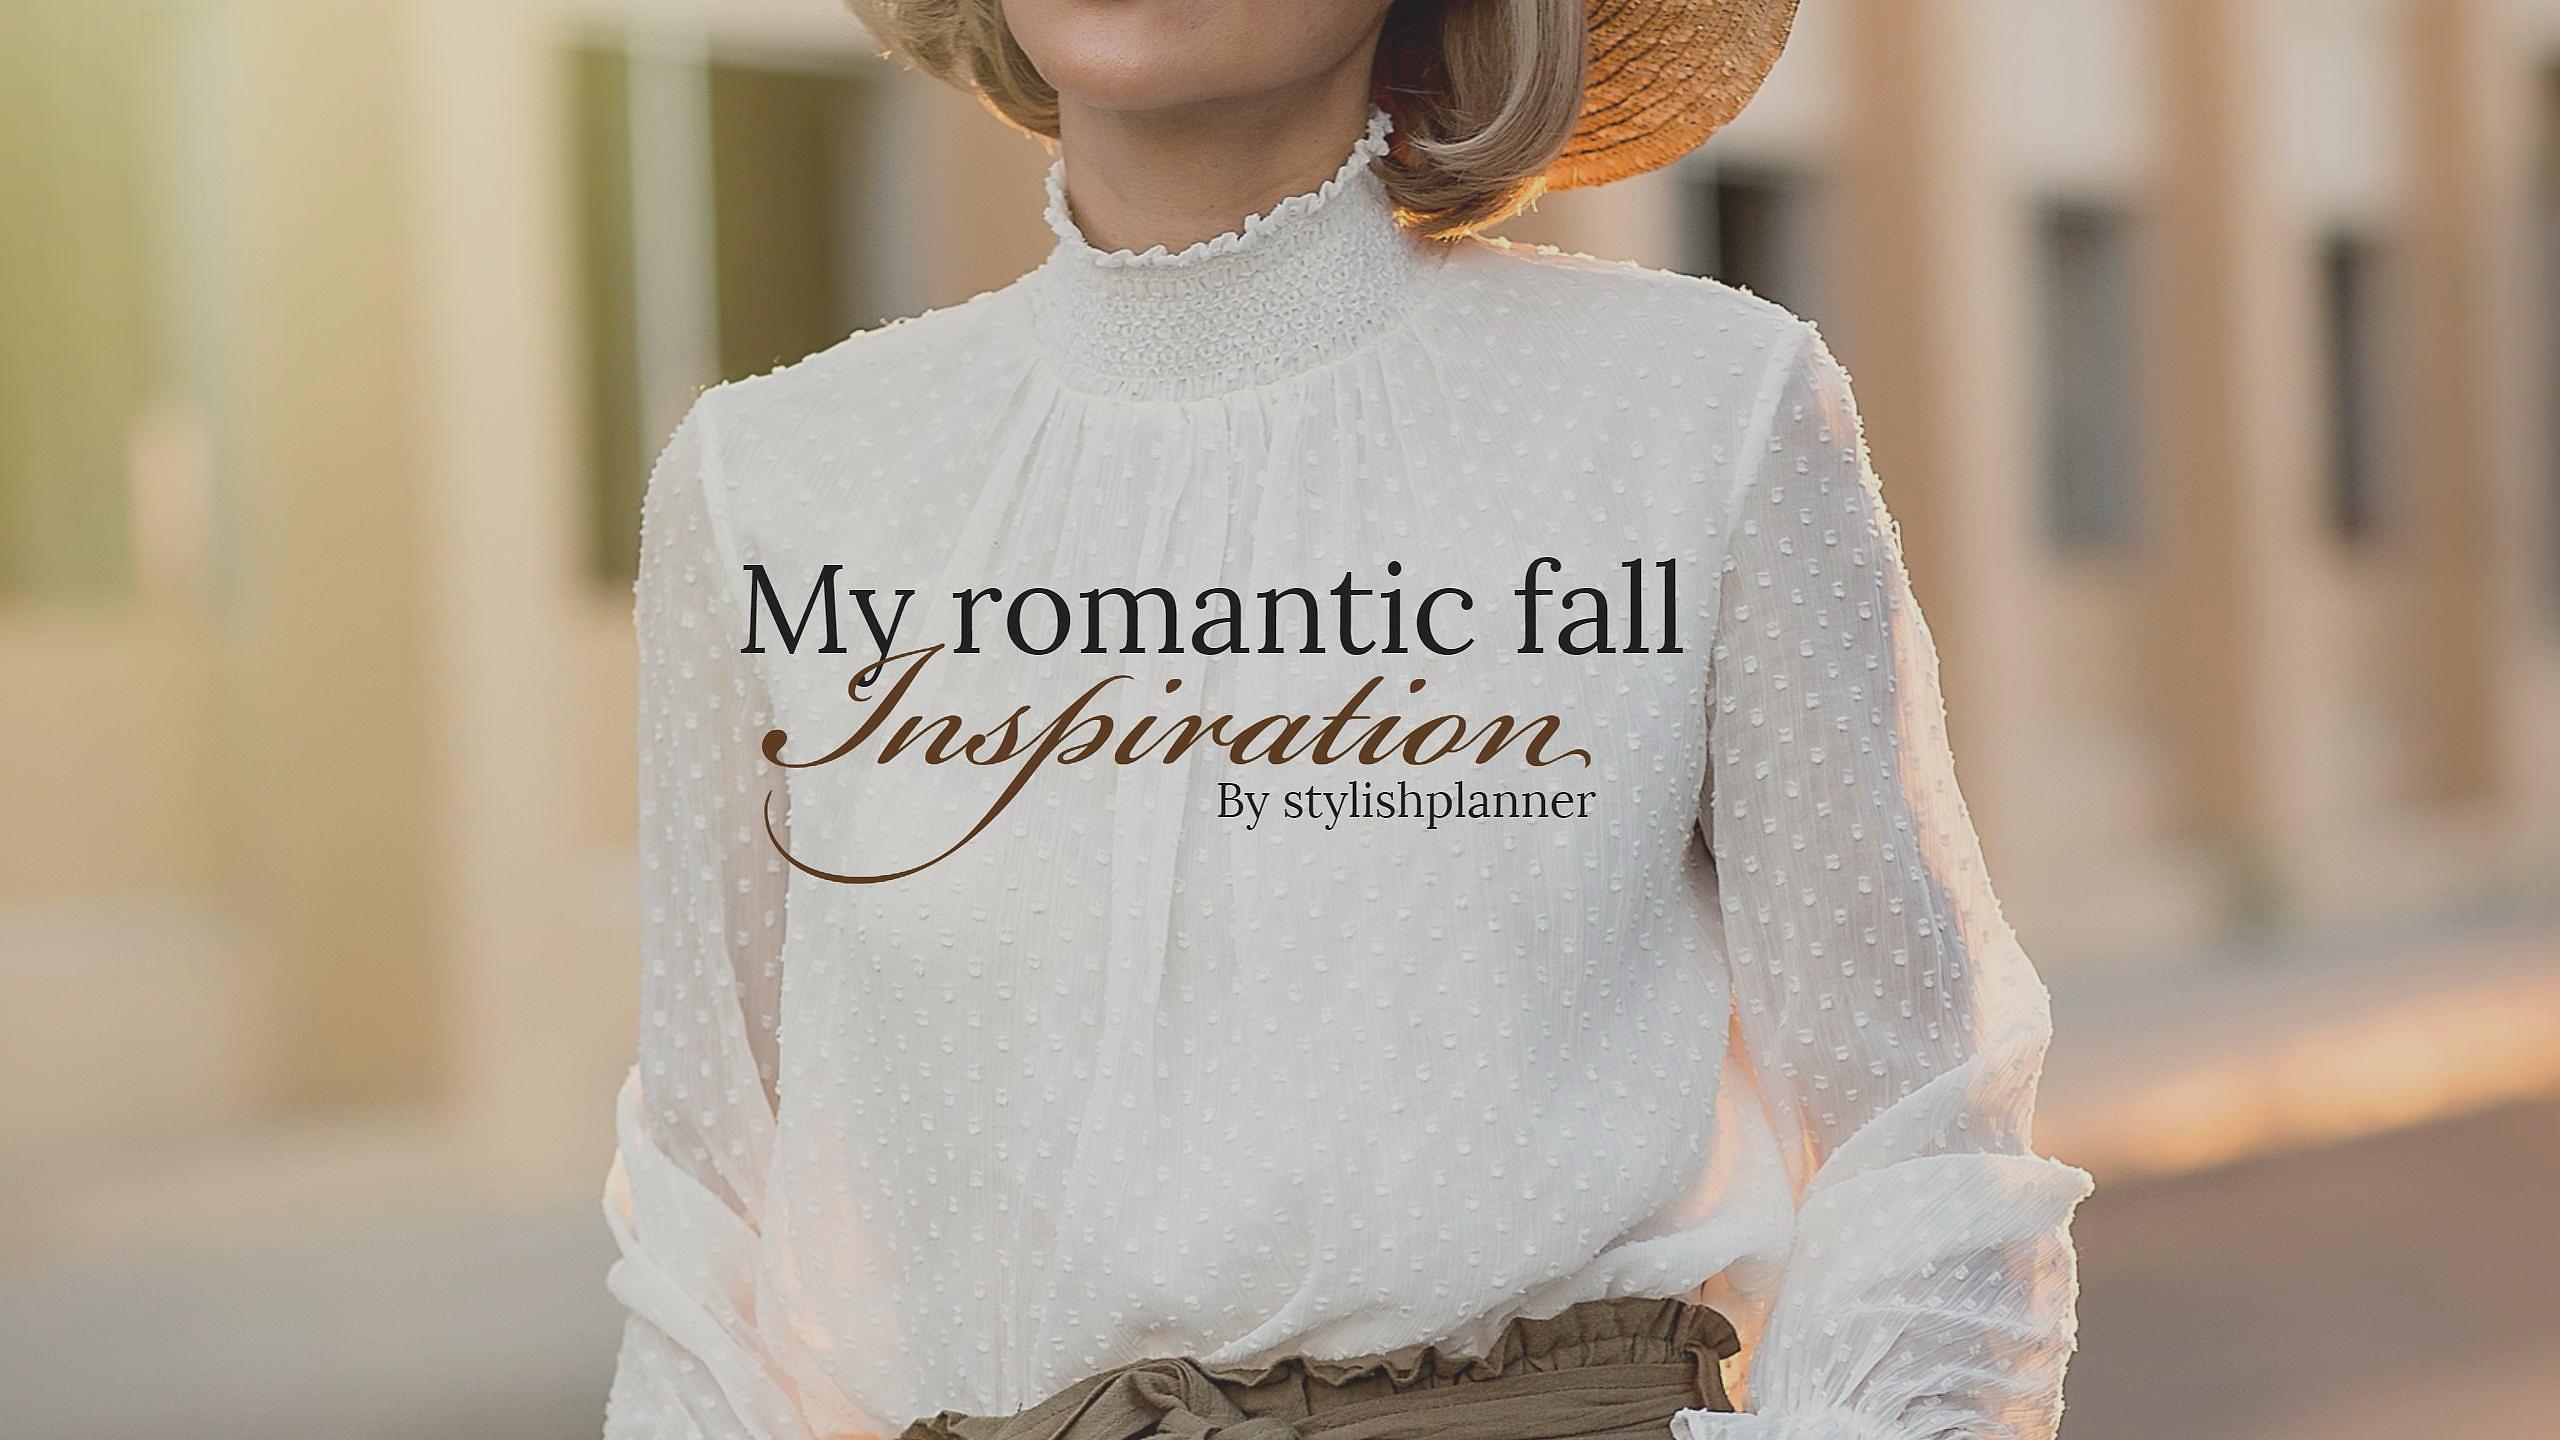 Romantic fall inspo